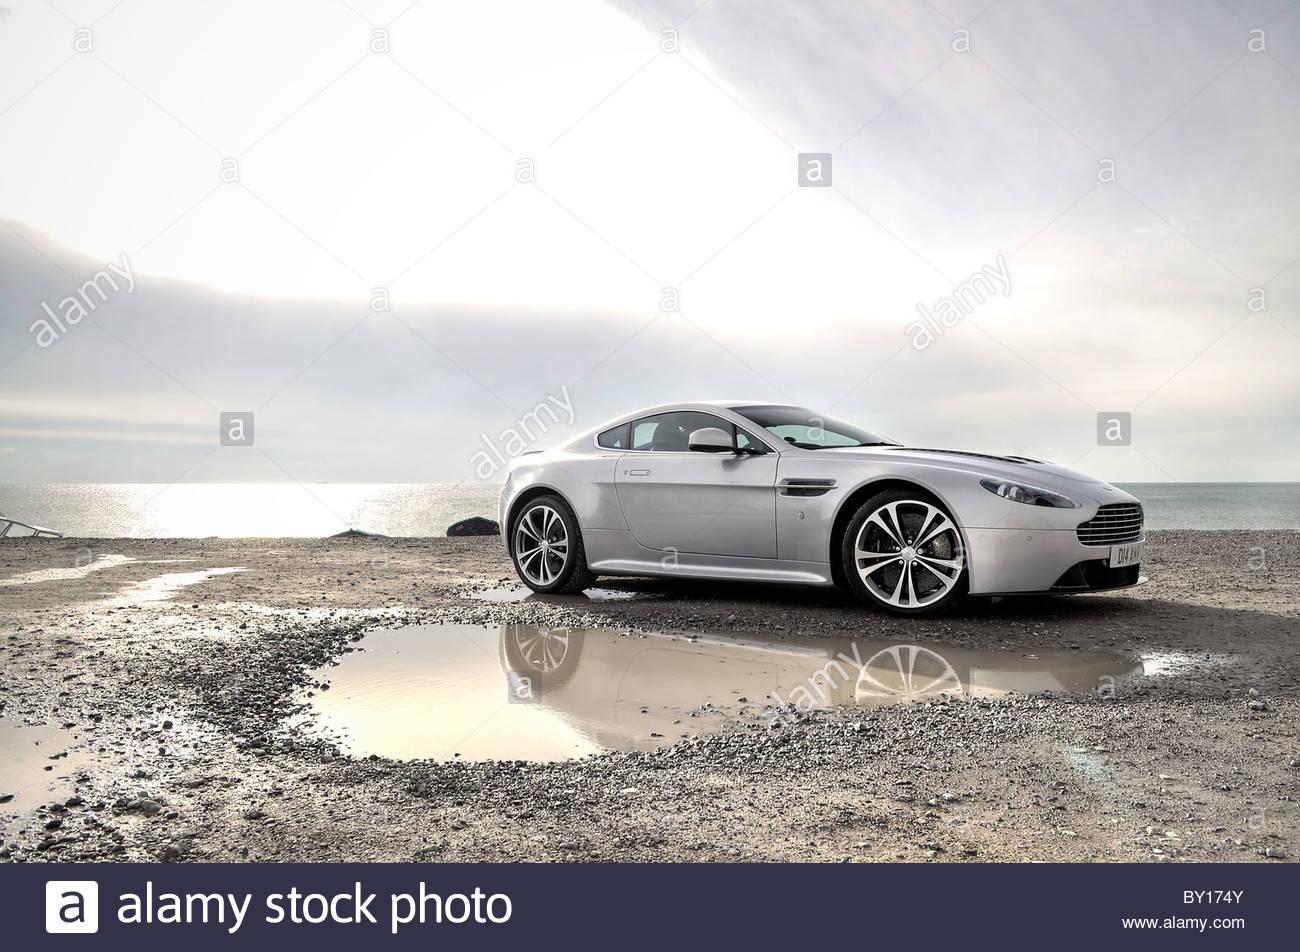 Aston Martin V12 Vantage Stockbild